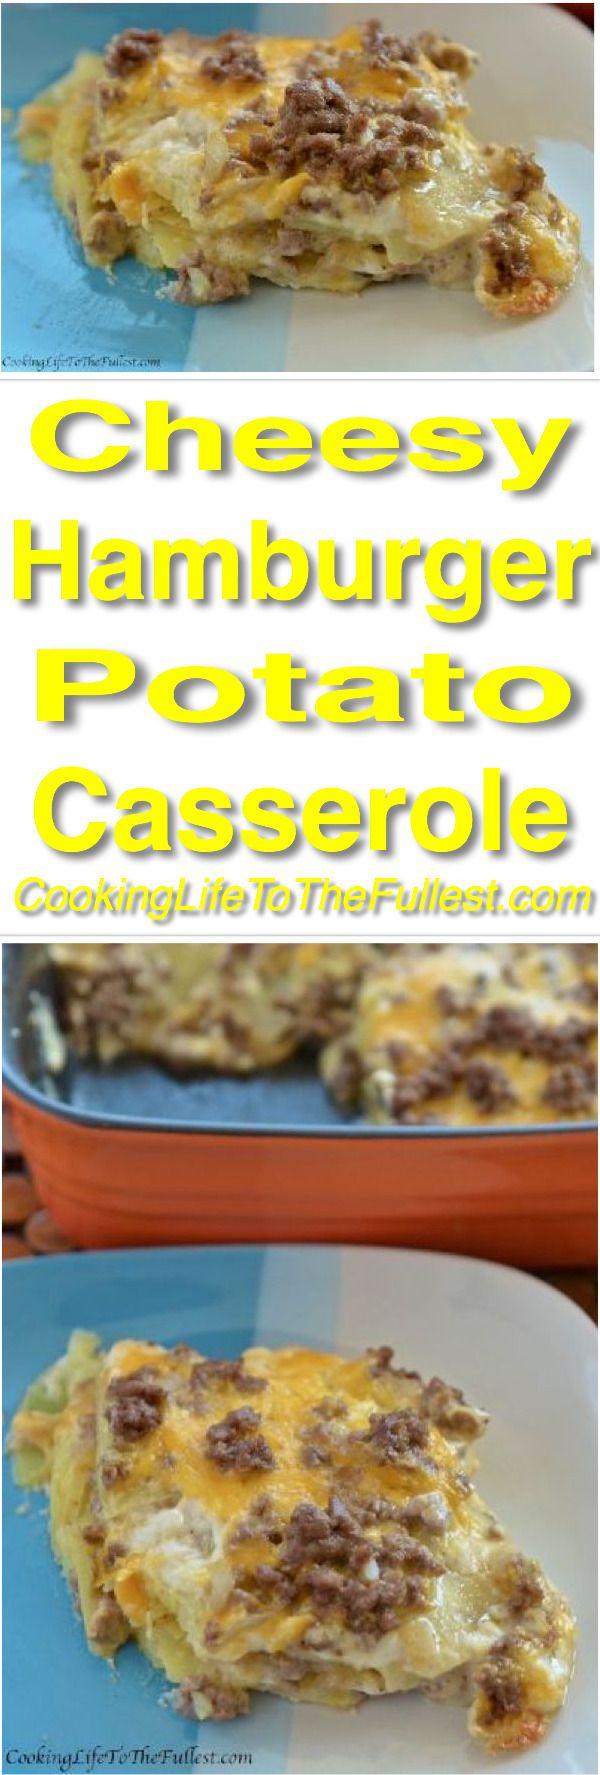 Cheesy Hamburger and Potato Casserole